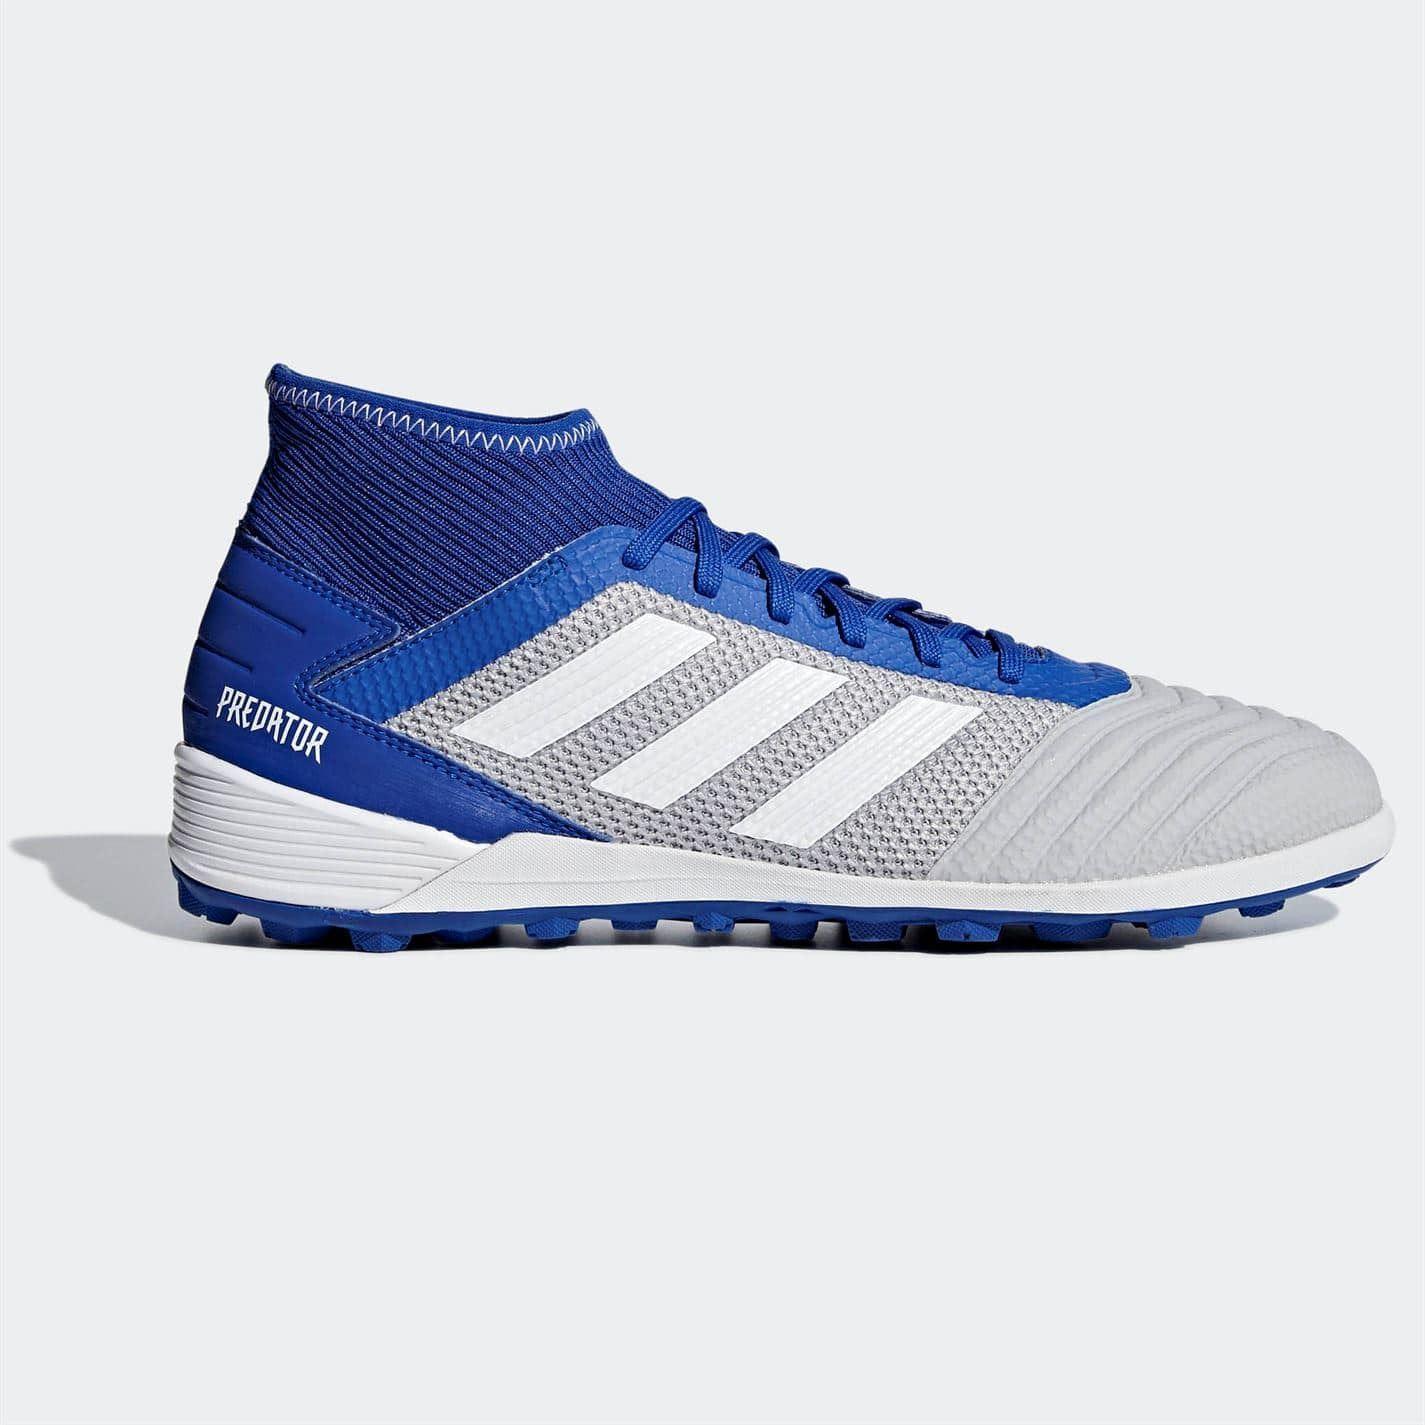 Details about adidas Predator 19.3 Astro Turf Football Boots Mens WhiteBlue